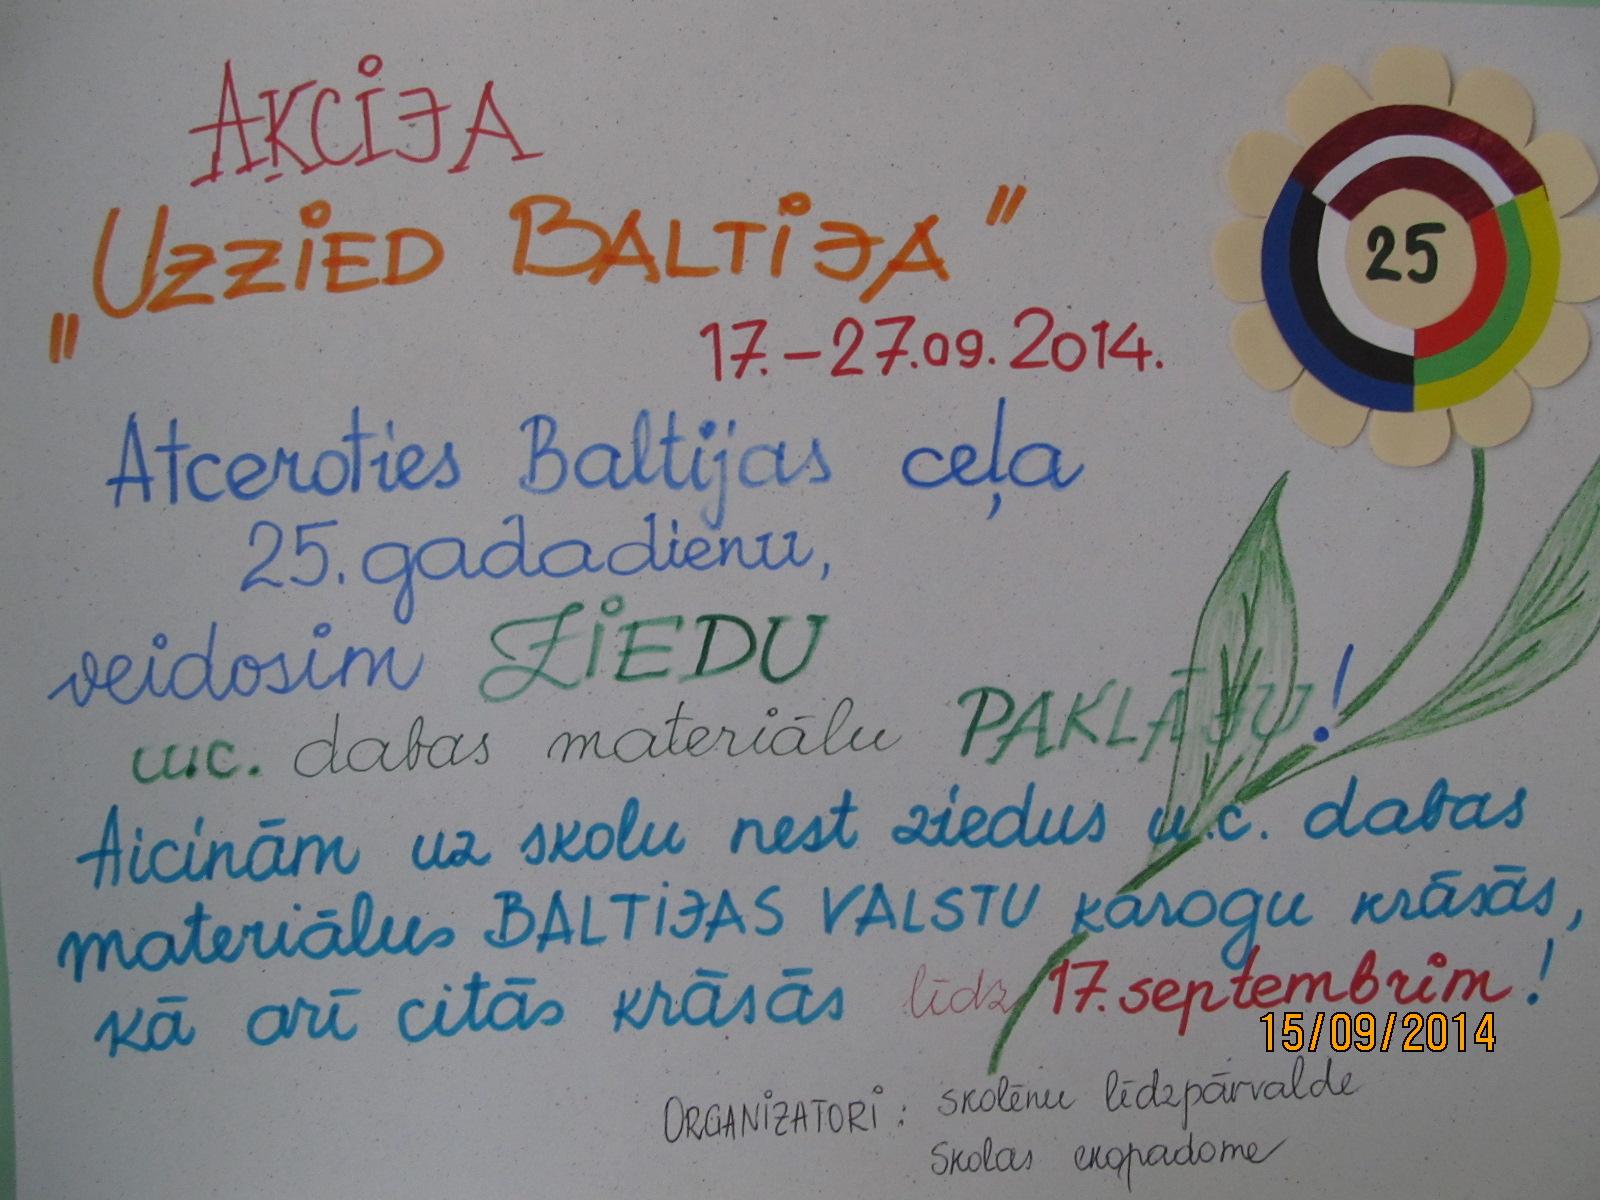 uzzied_baltija